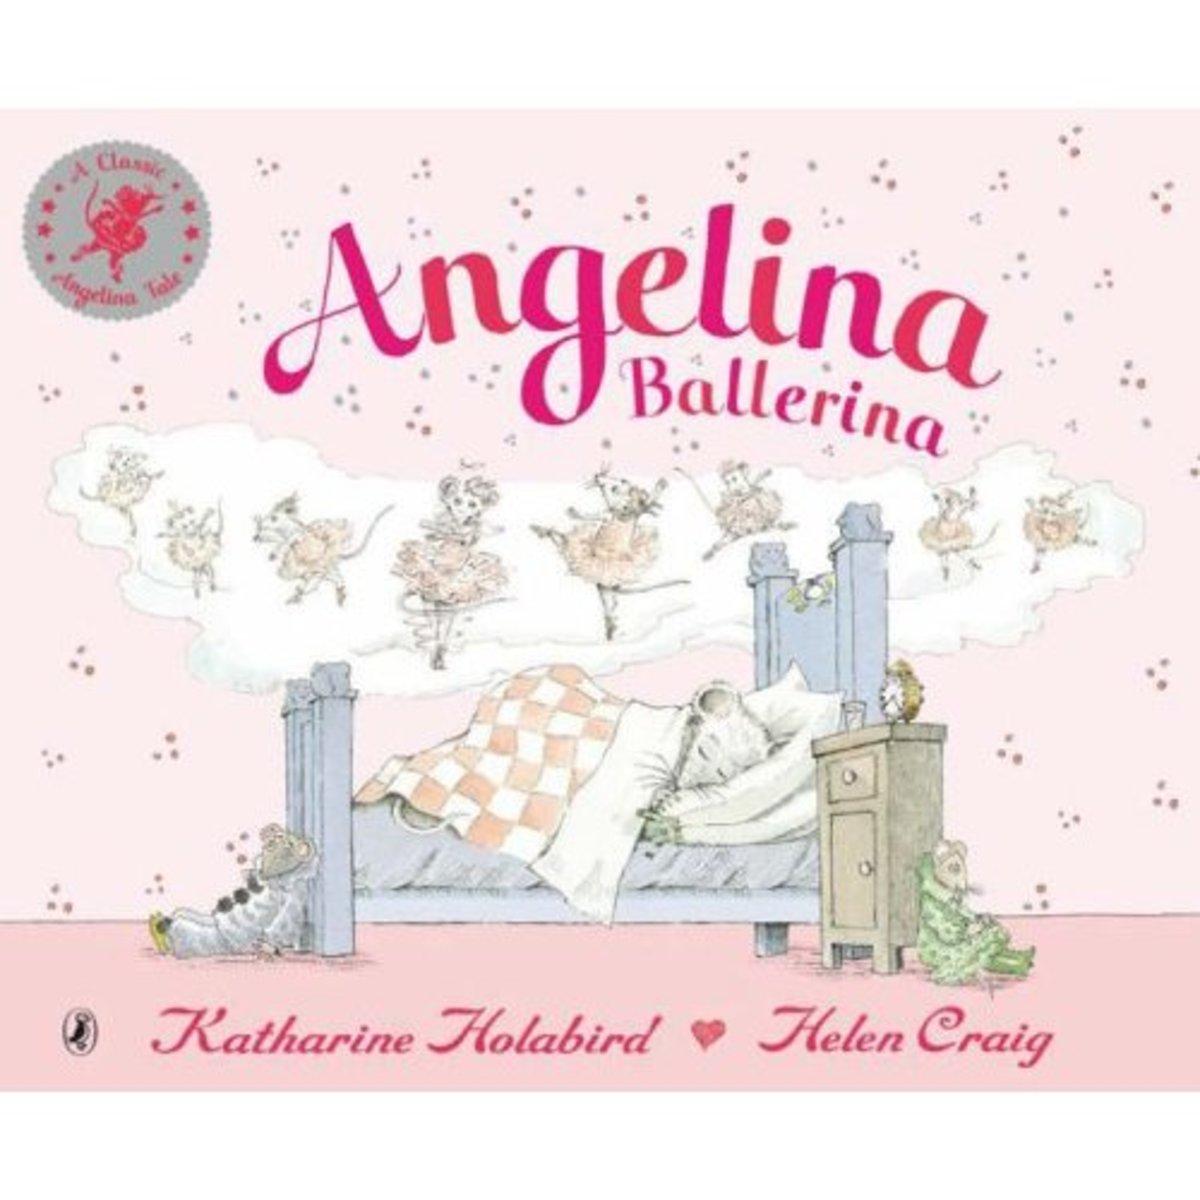 Angelina Ballerina by Katherine Holabird